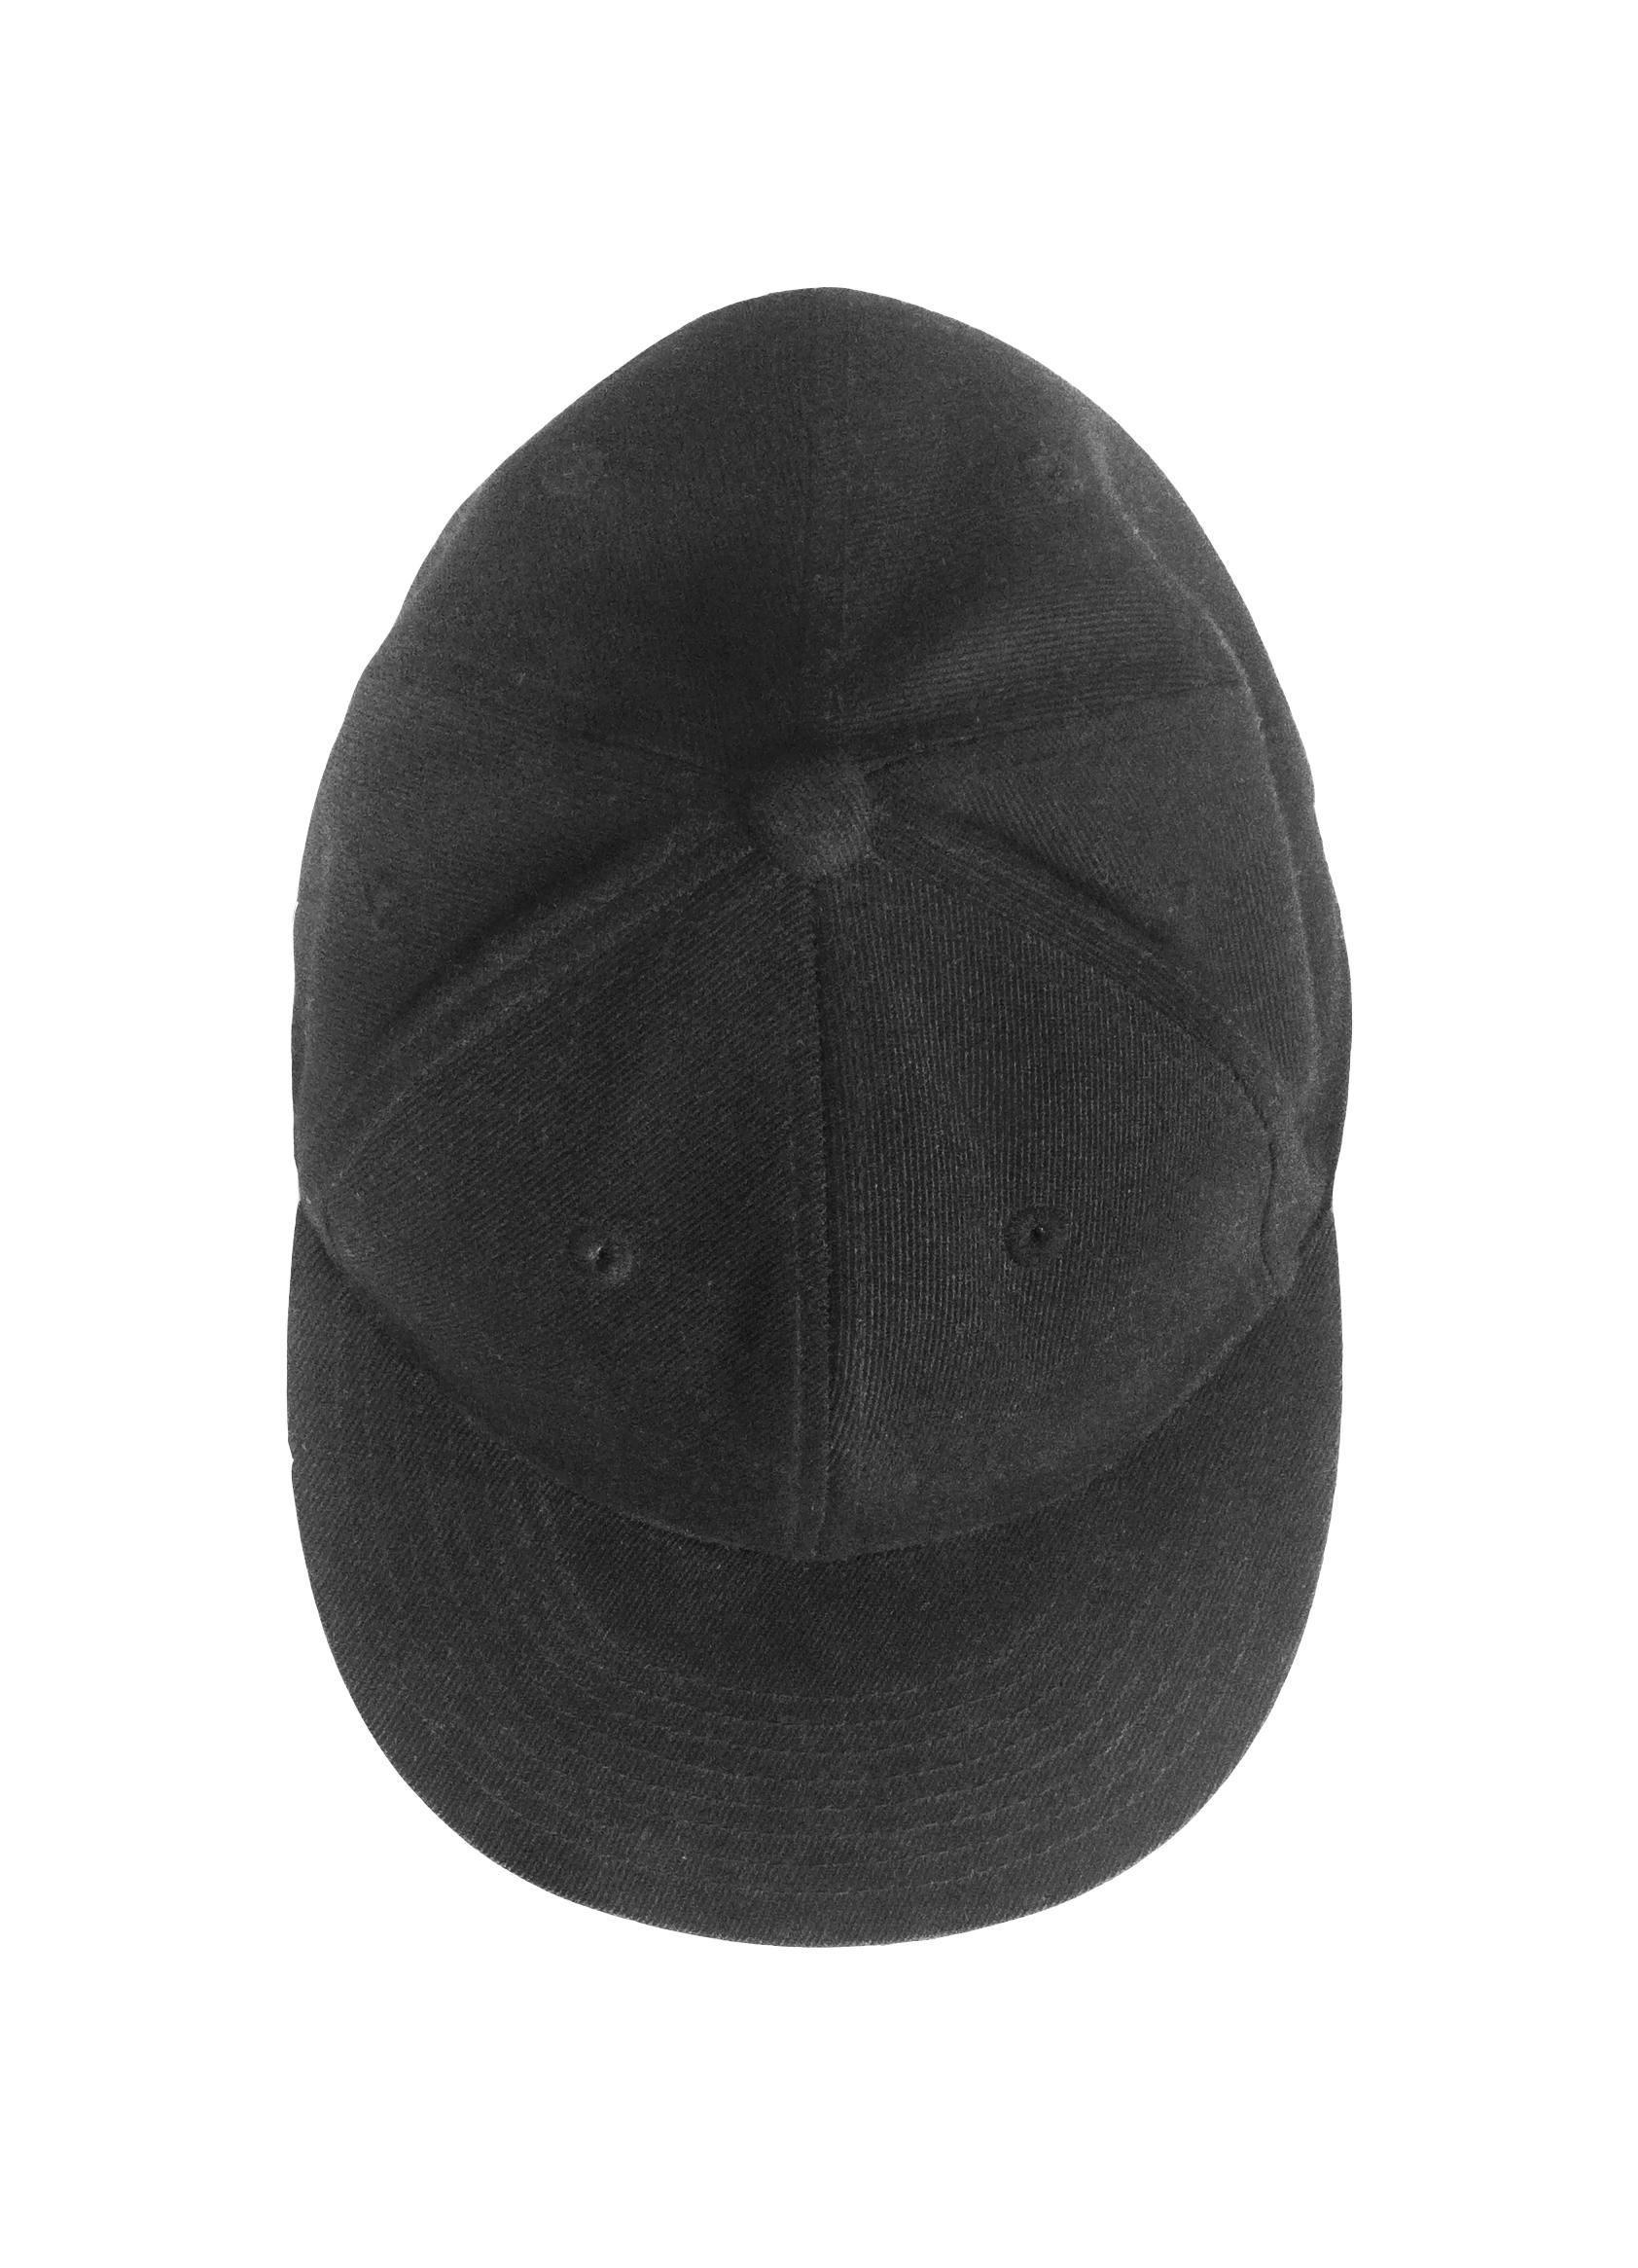 Fitted baseball cap.  Gift of Aoudlaloo Qinnauyuaq, 2000-2016.